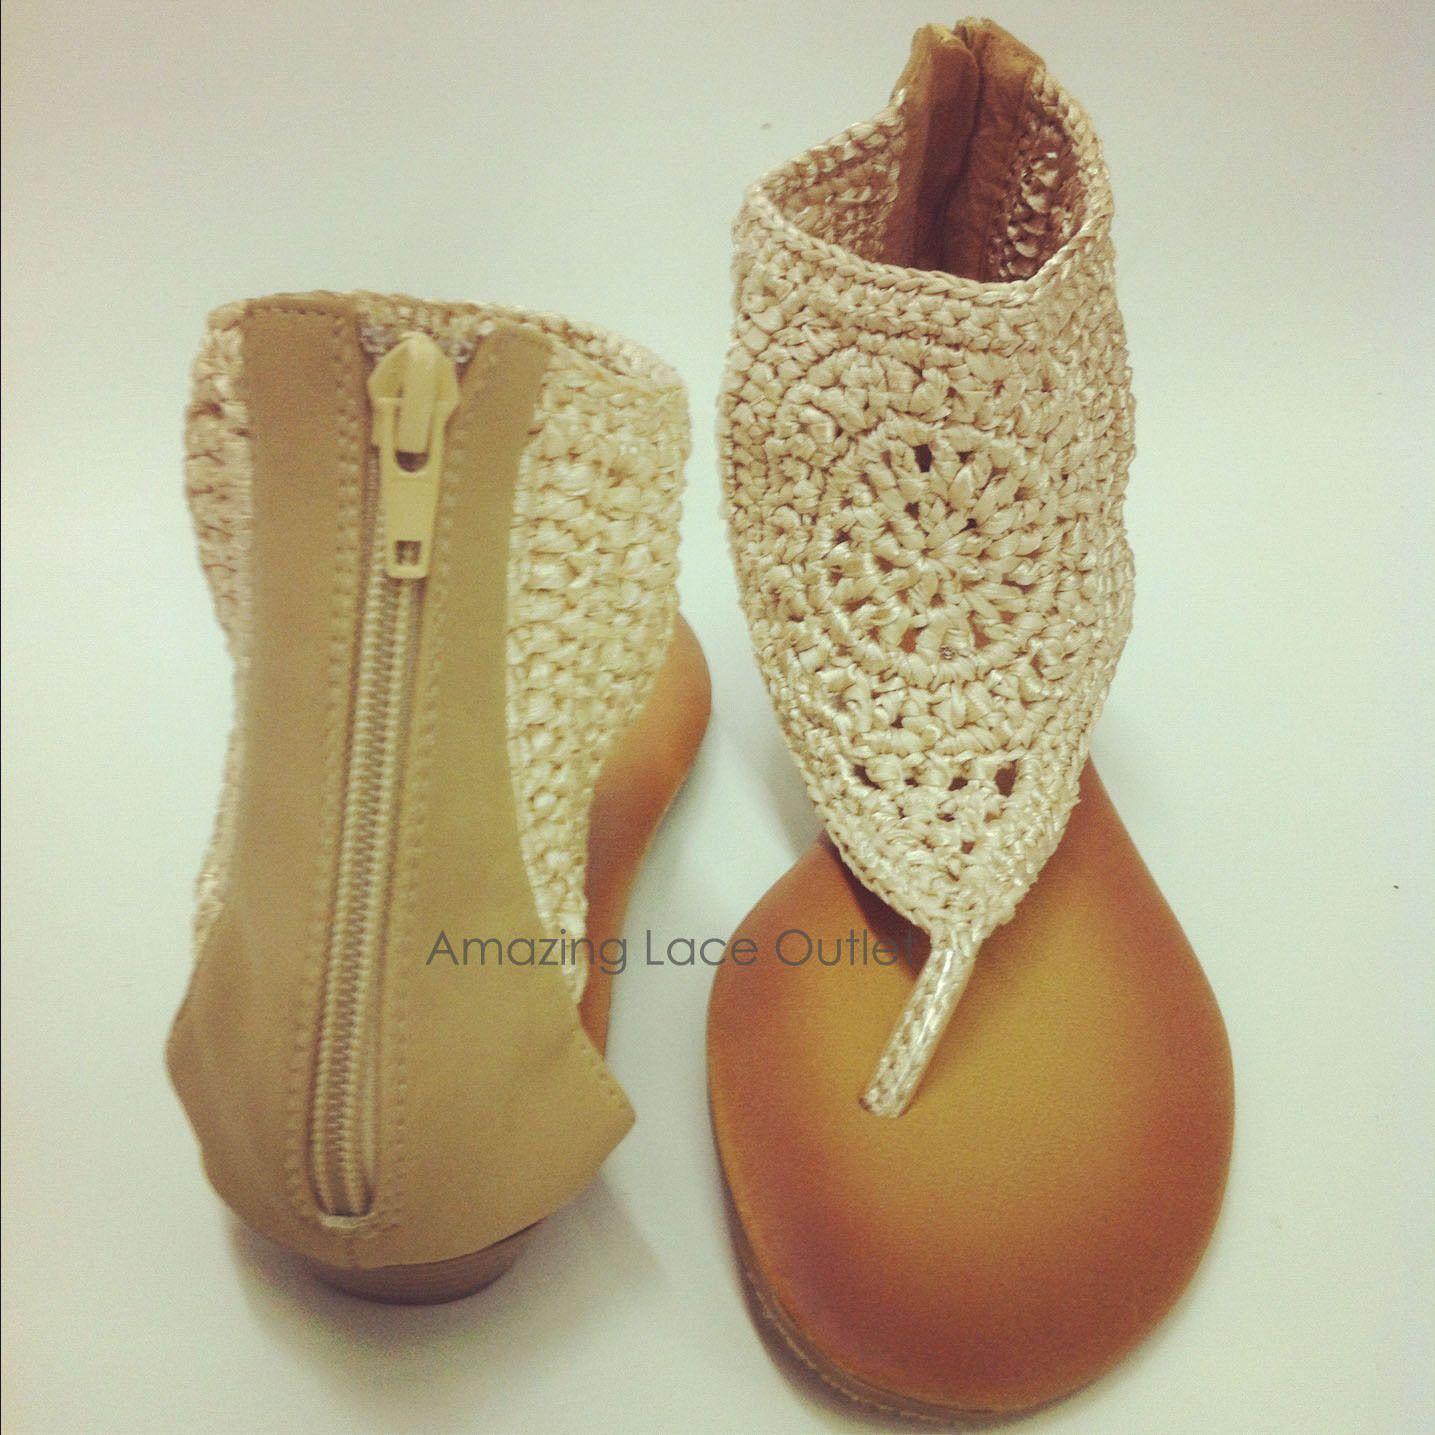 89af173901b CROCHET ANLE STRAP Sandals Tribal Thong Open Toe Flats Back Zip Gladiator  Shoe  I have in black already  )